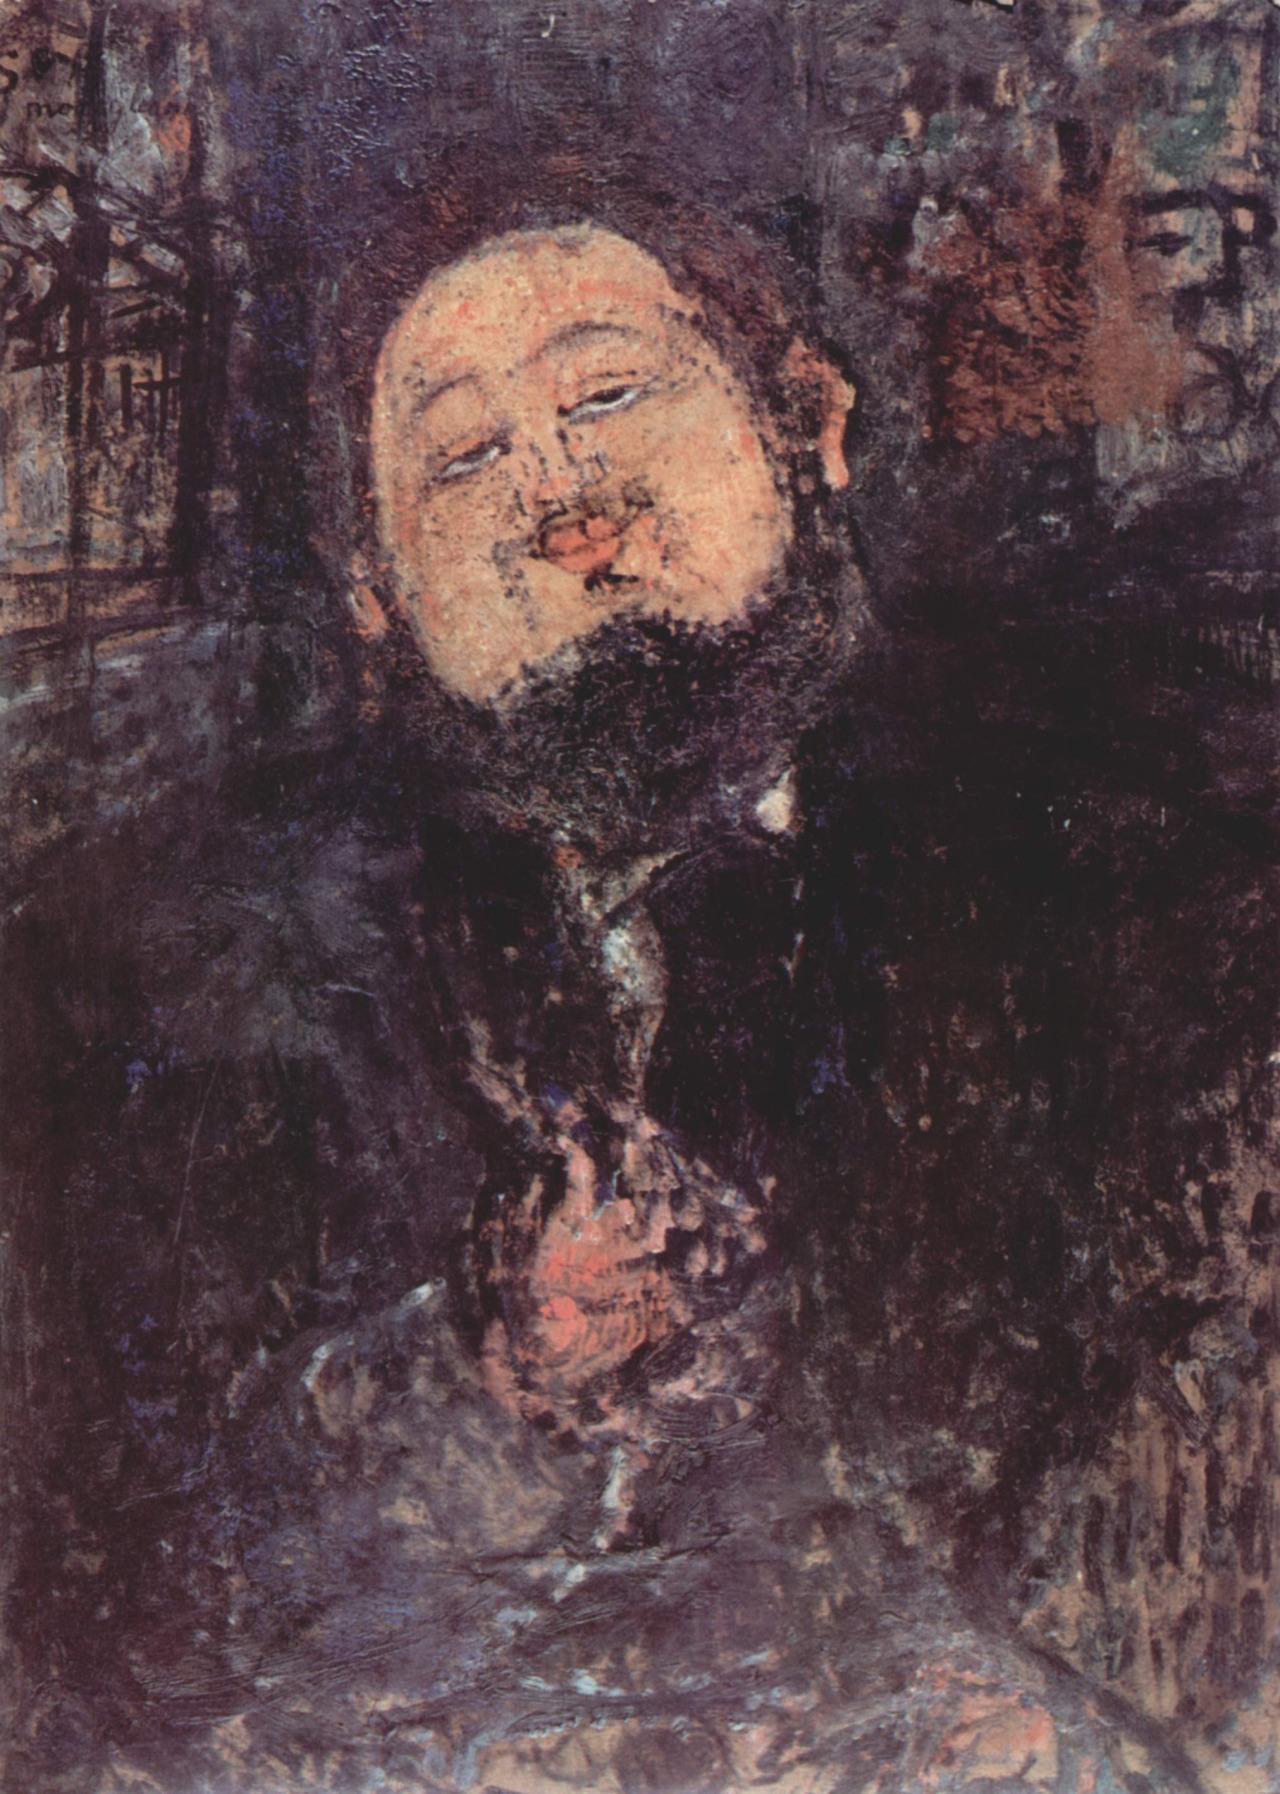 Amedeo Modigliani, portrait of Diego Rivera (1914).